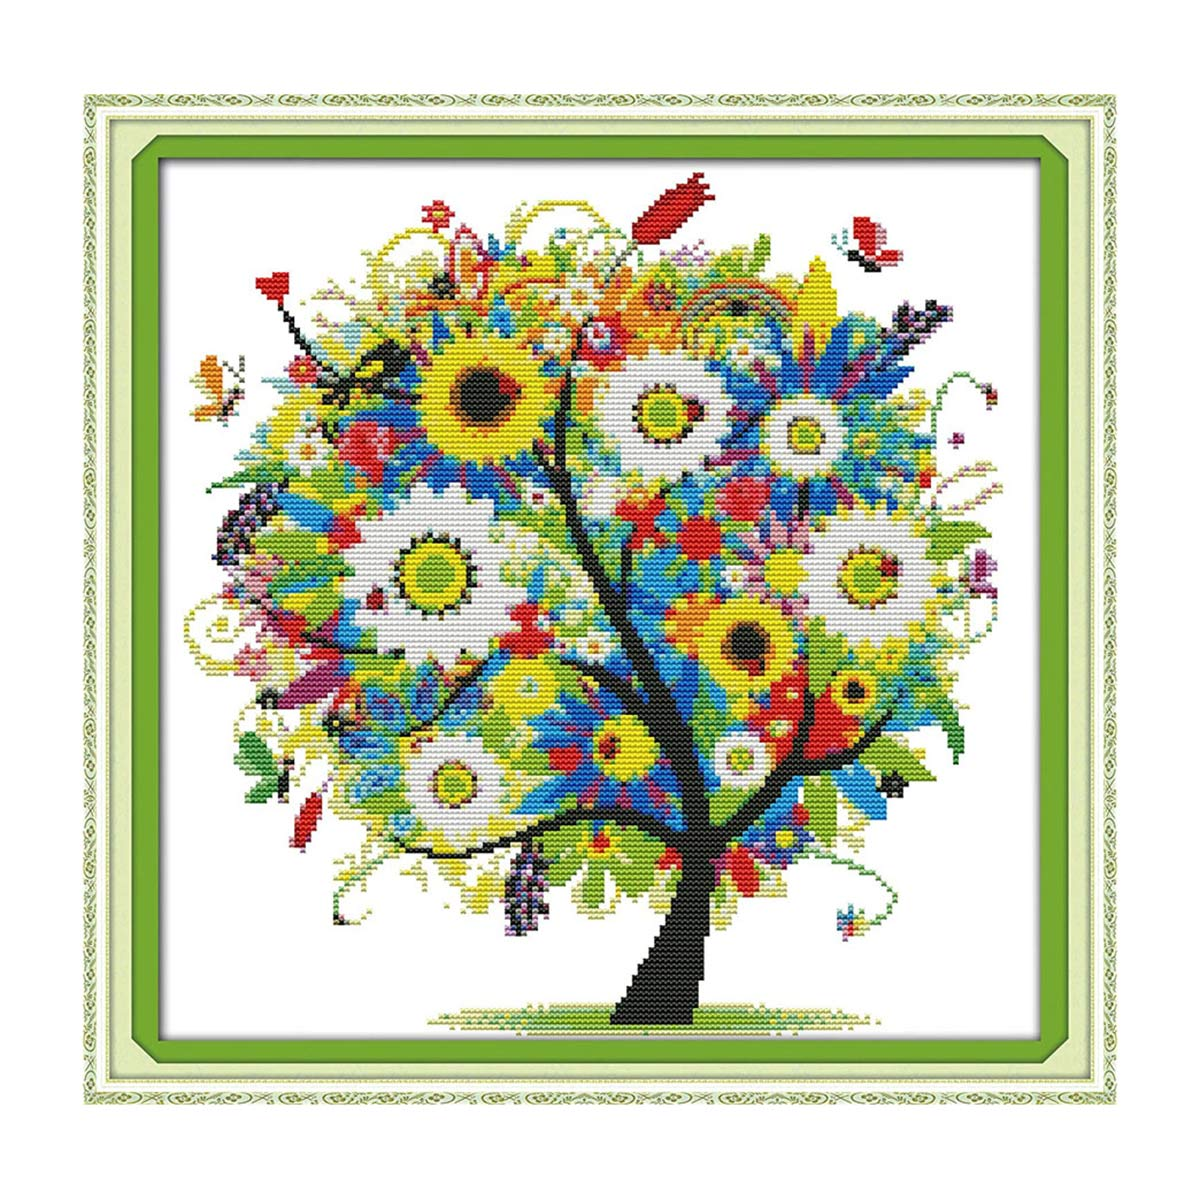 7654 Мозаика Cristal 'Солнечное дерево', 50*50 см